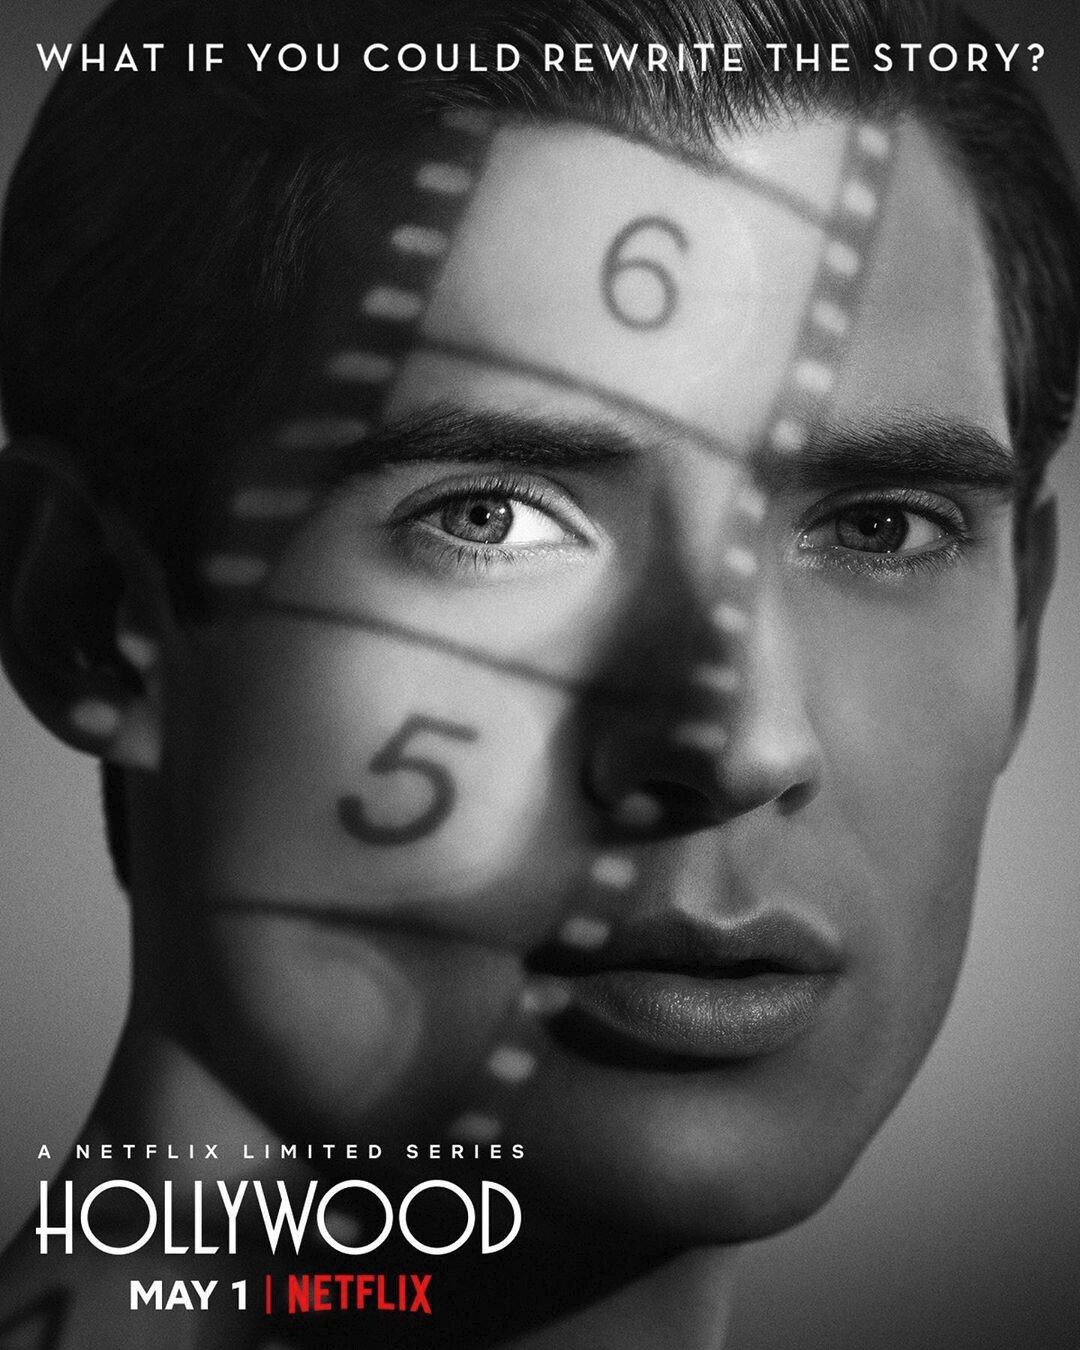 Hollywood serial